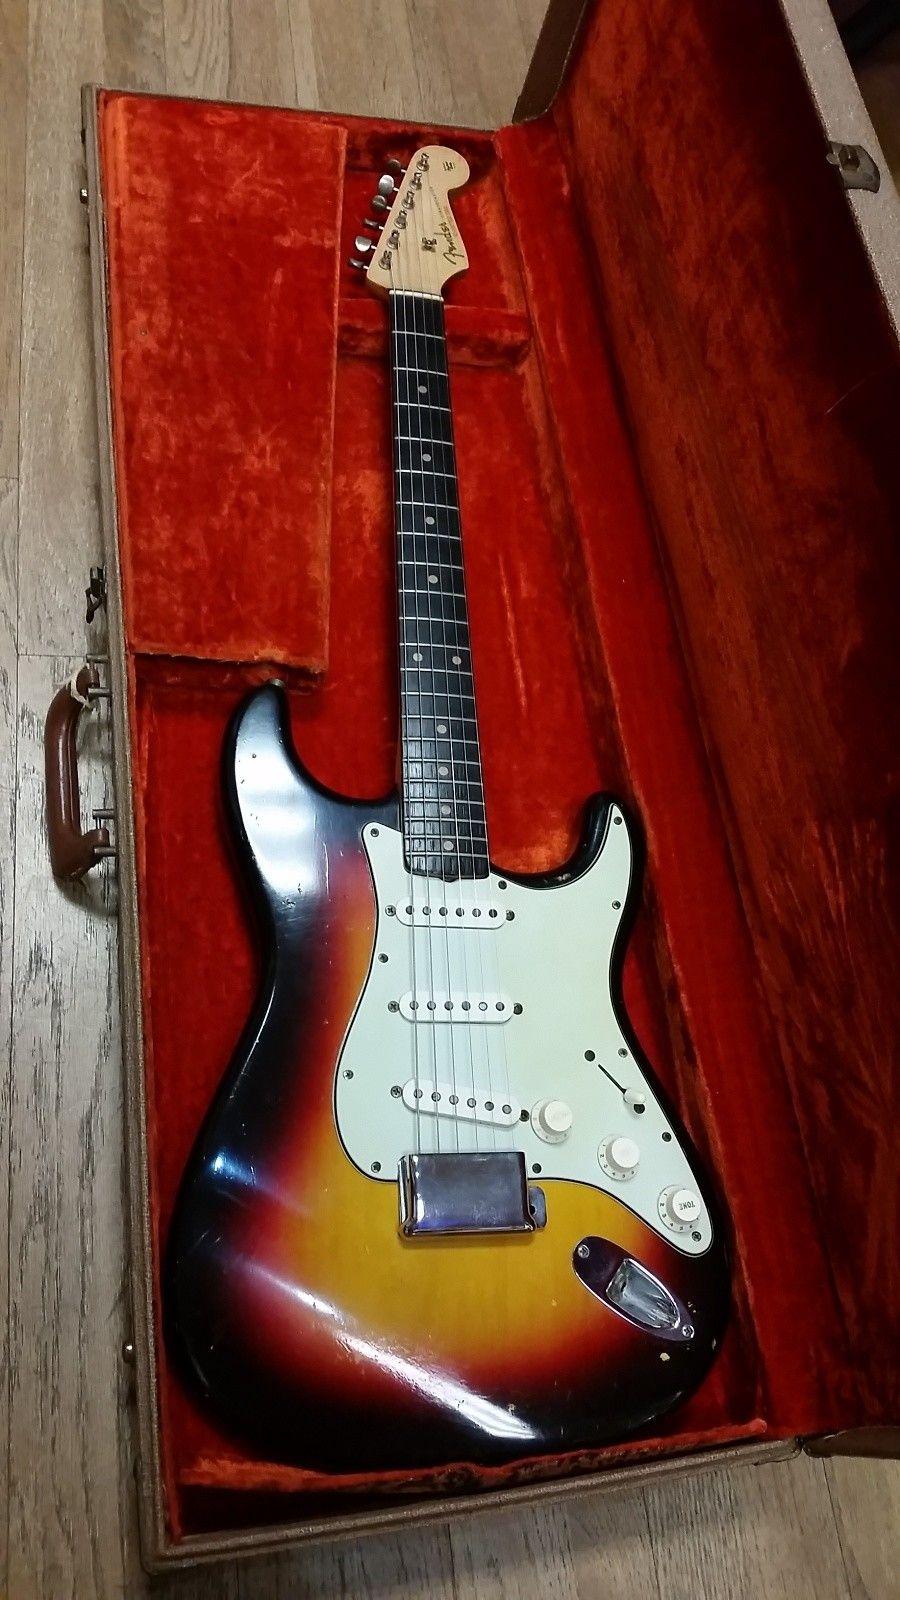 original 1962 fender stratocaster sunburst reverb 1962 fender stratocaster fender guitar amps fender [ 900 x 1600 Pixel ]